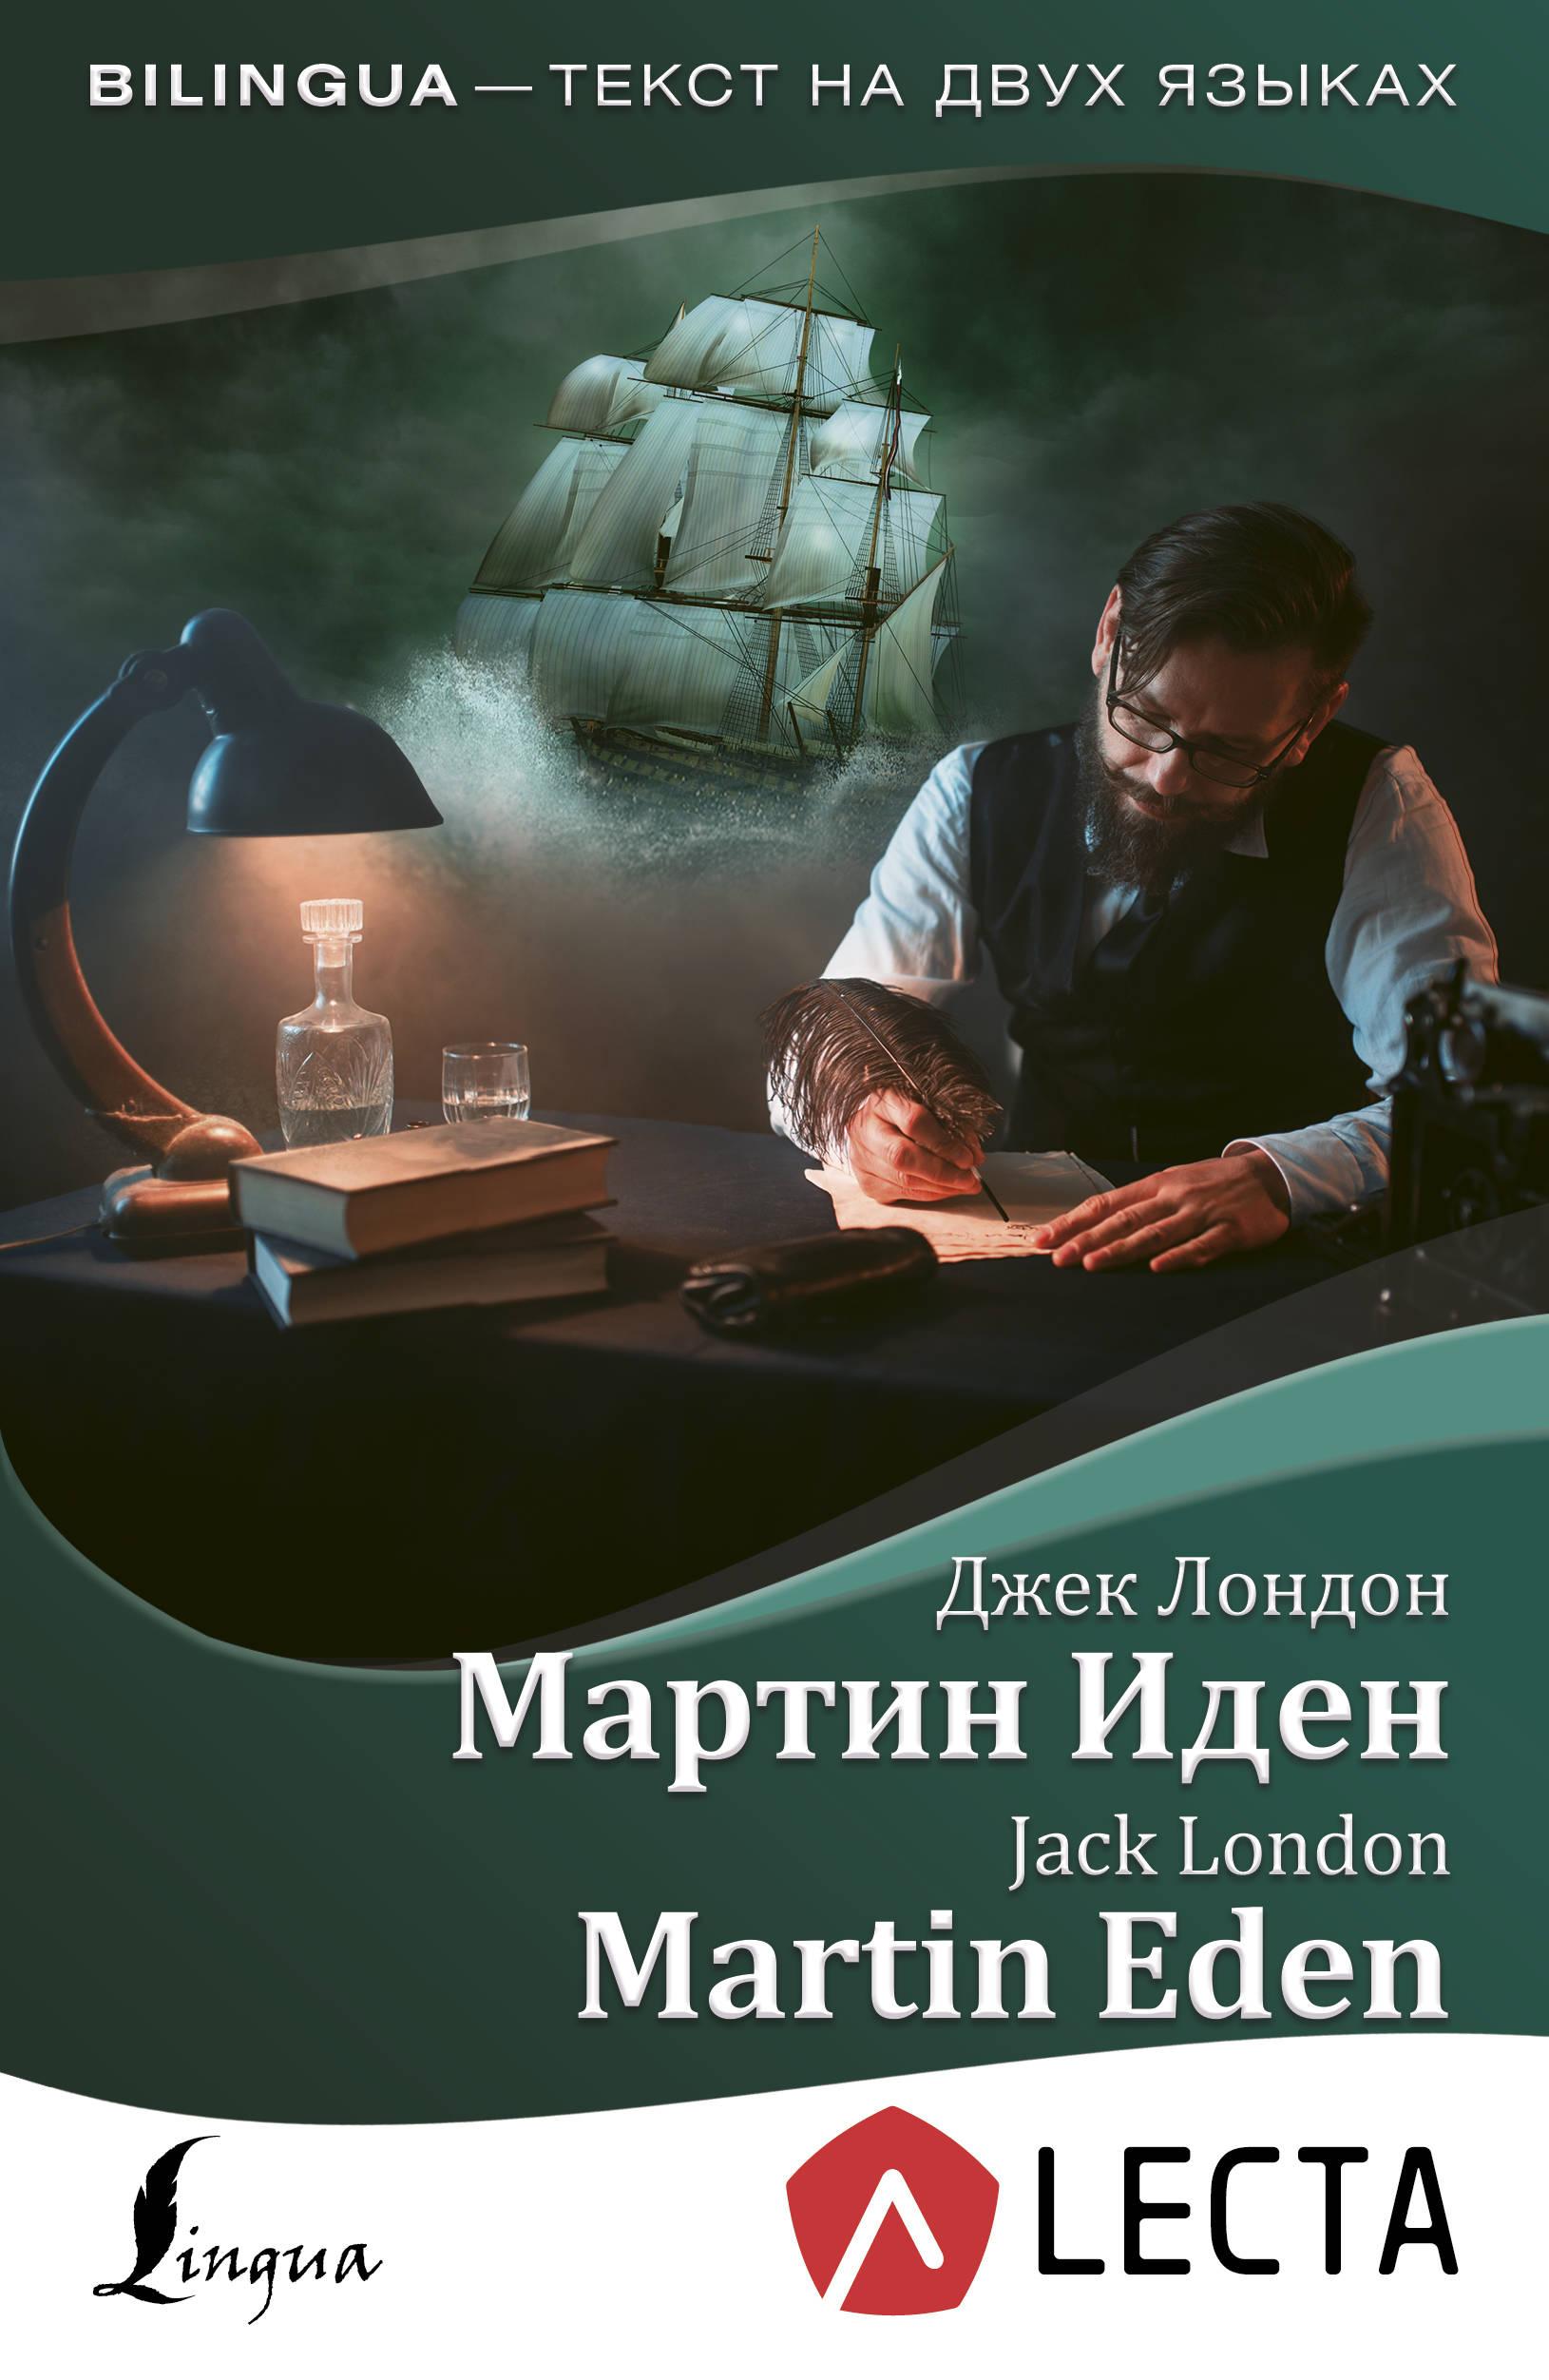 Martin Iden = Martin Eden + audioprilozhenie LECTA